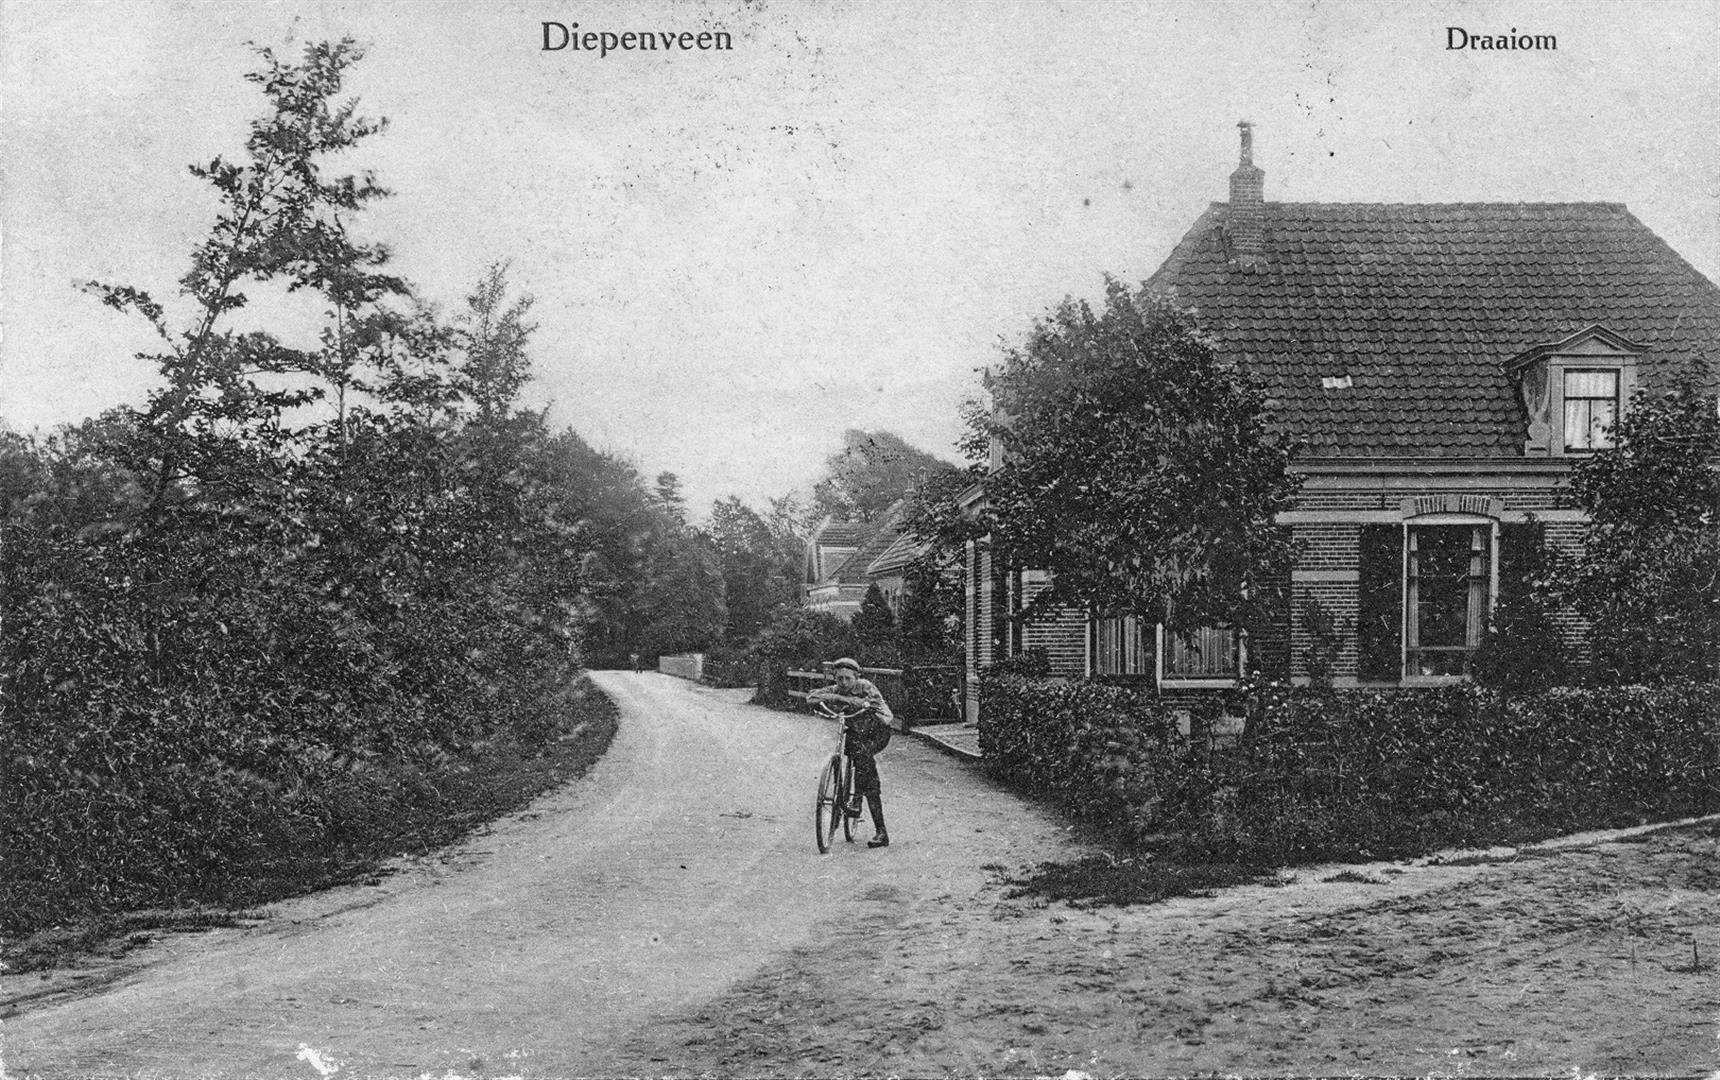 De-splitsing-Oranjelaan-Draaiomsweg-Large